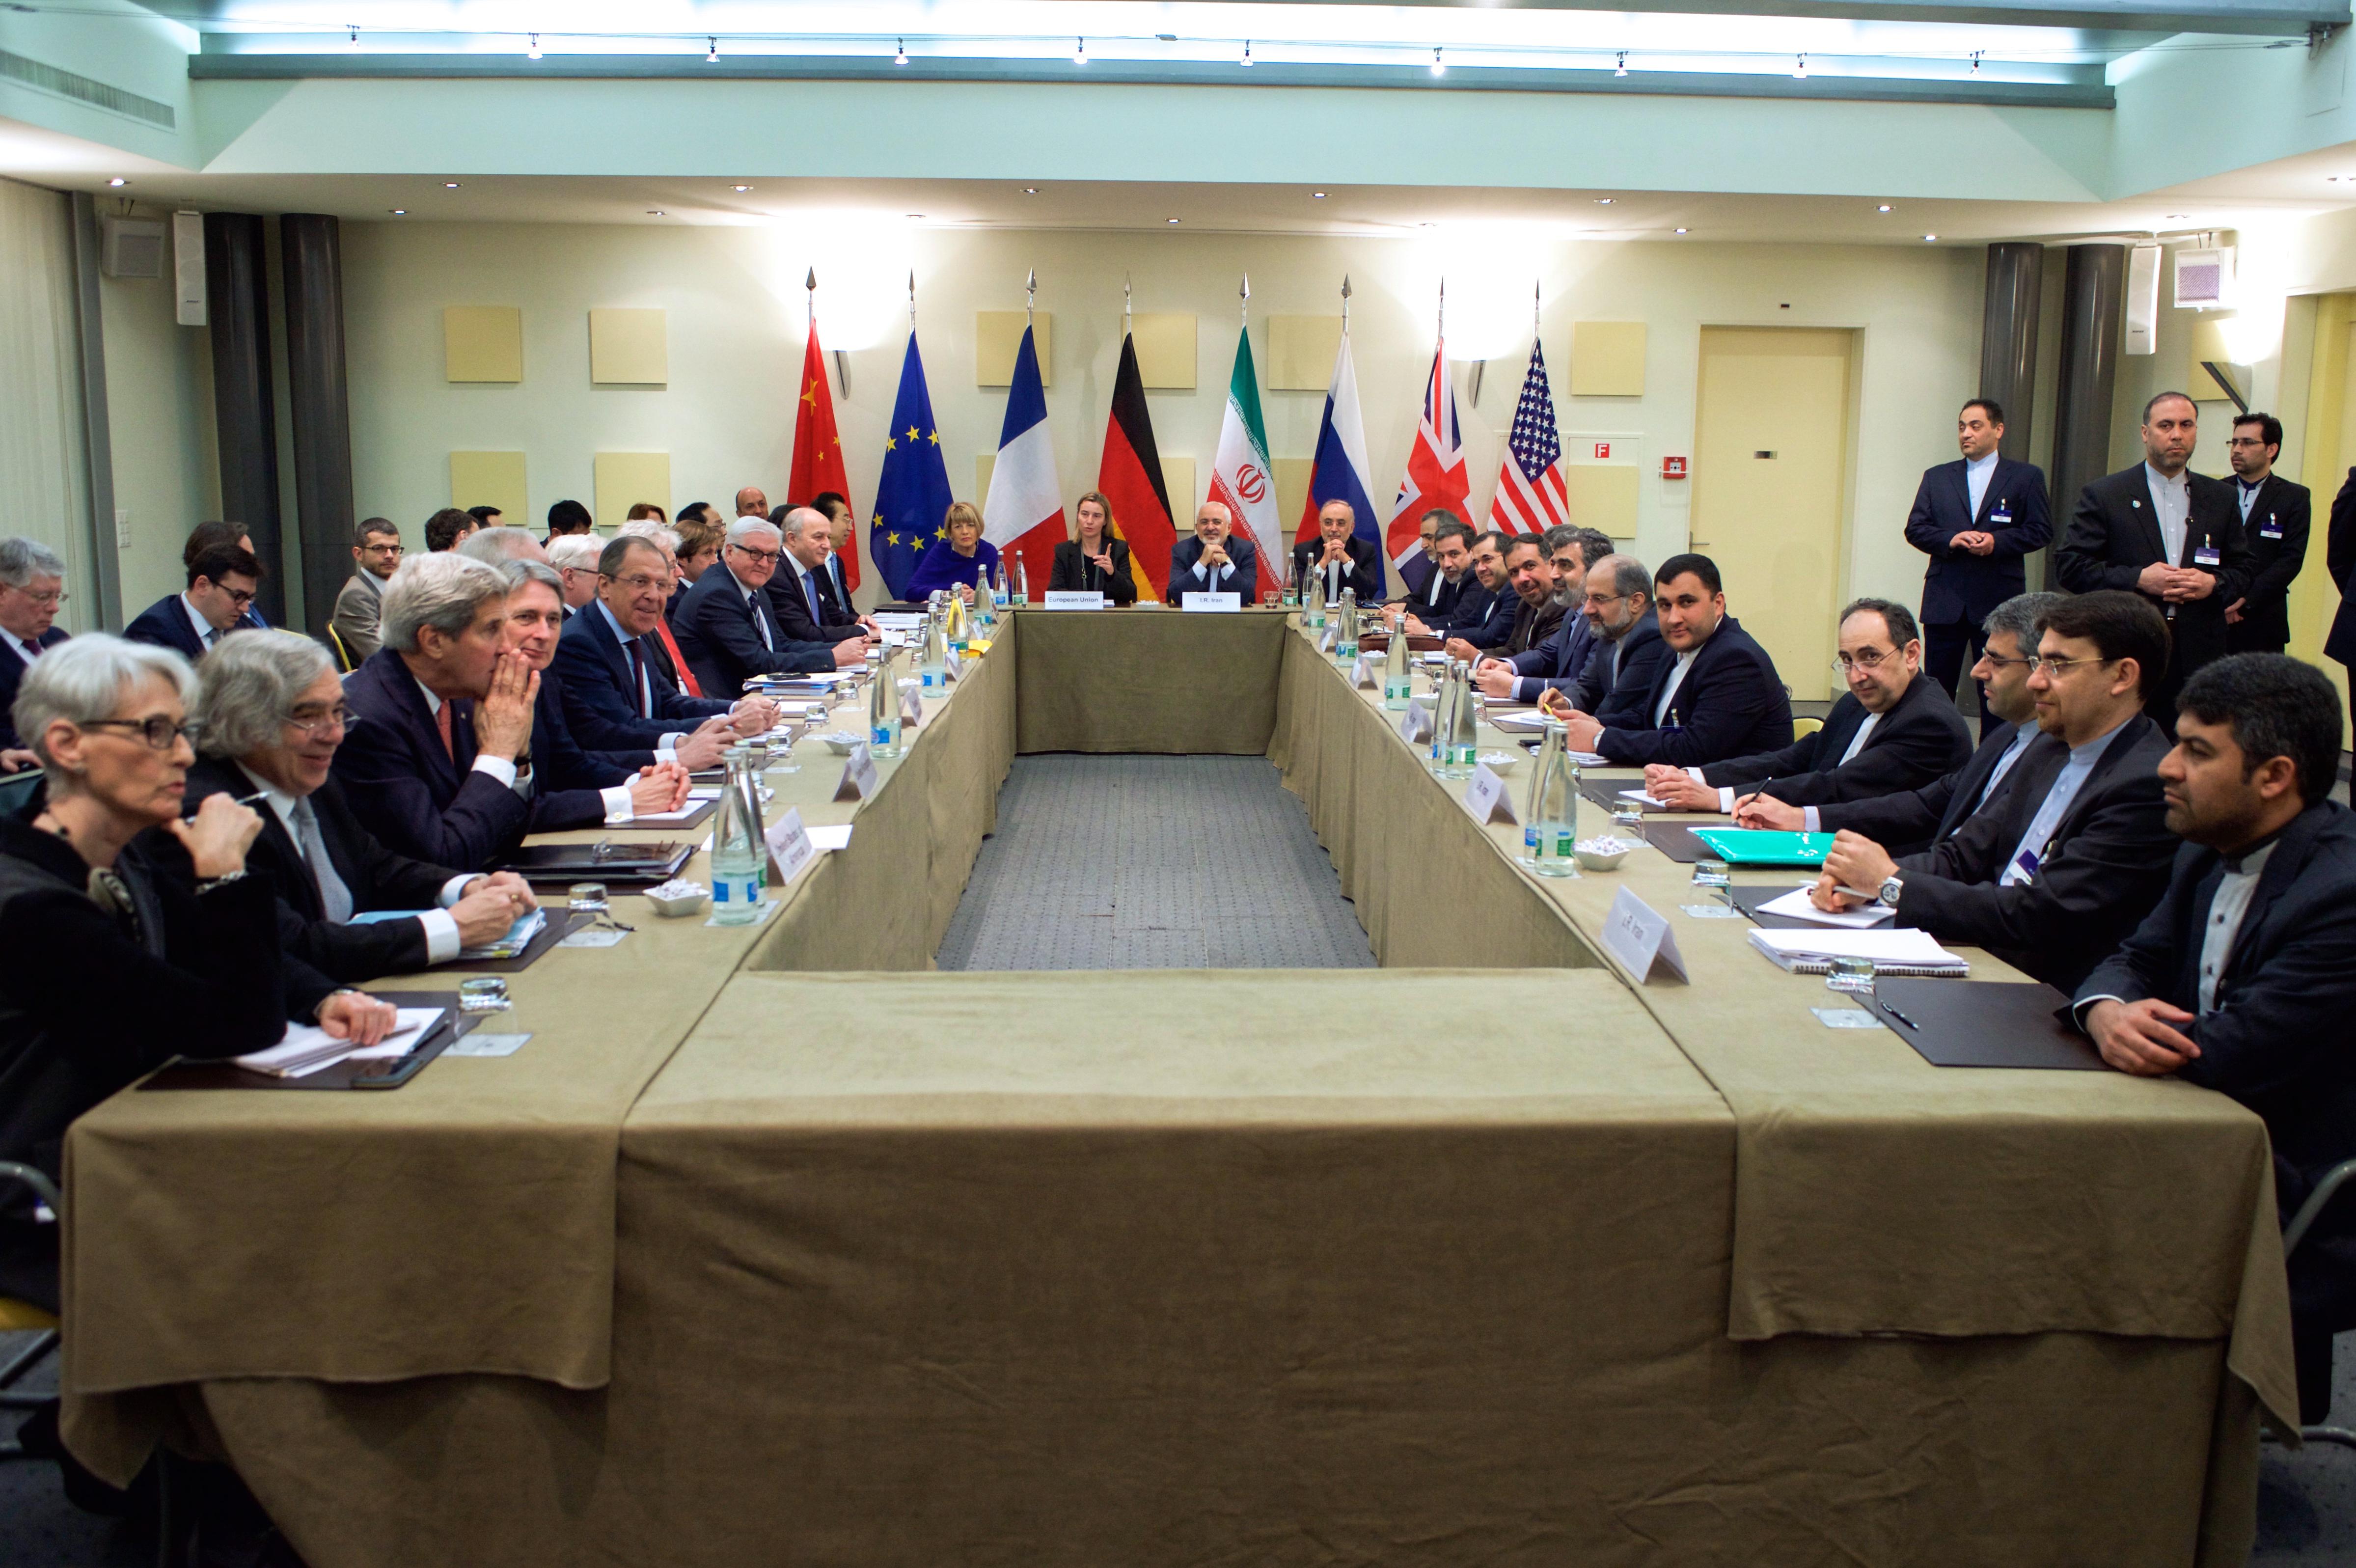 Negotiations on Iran Nuclear Program